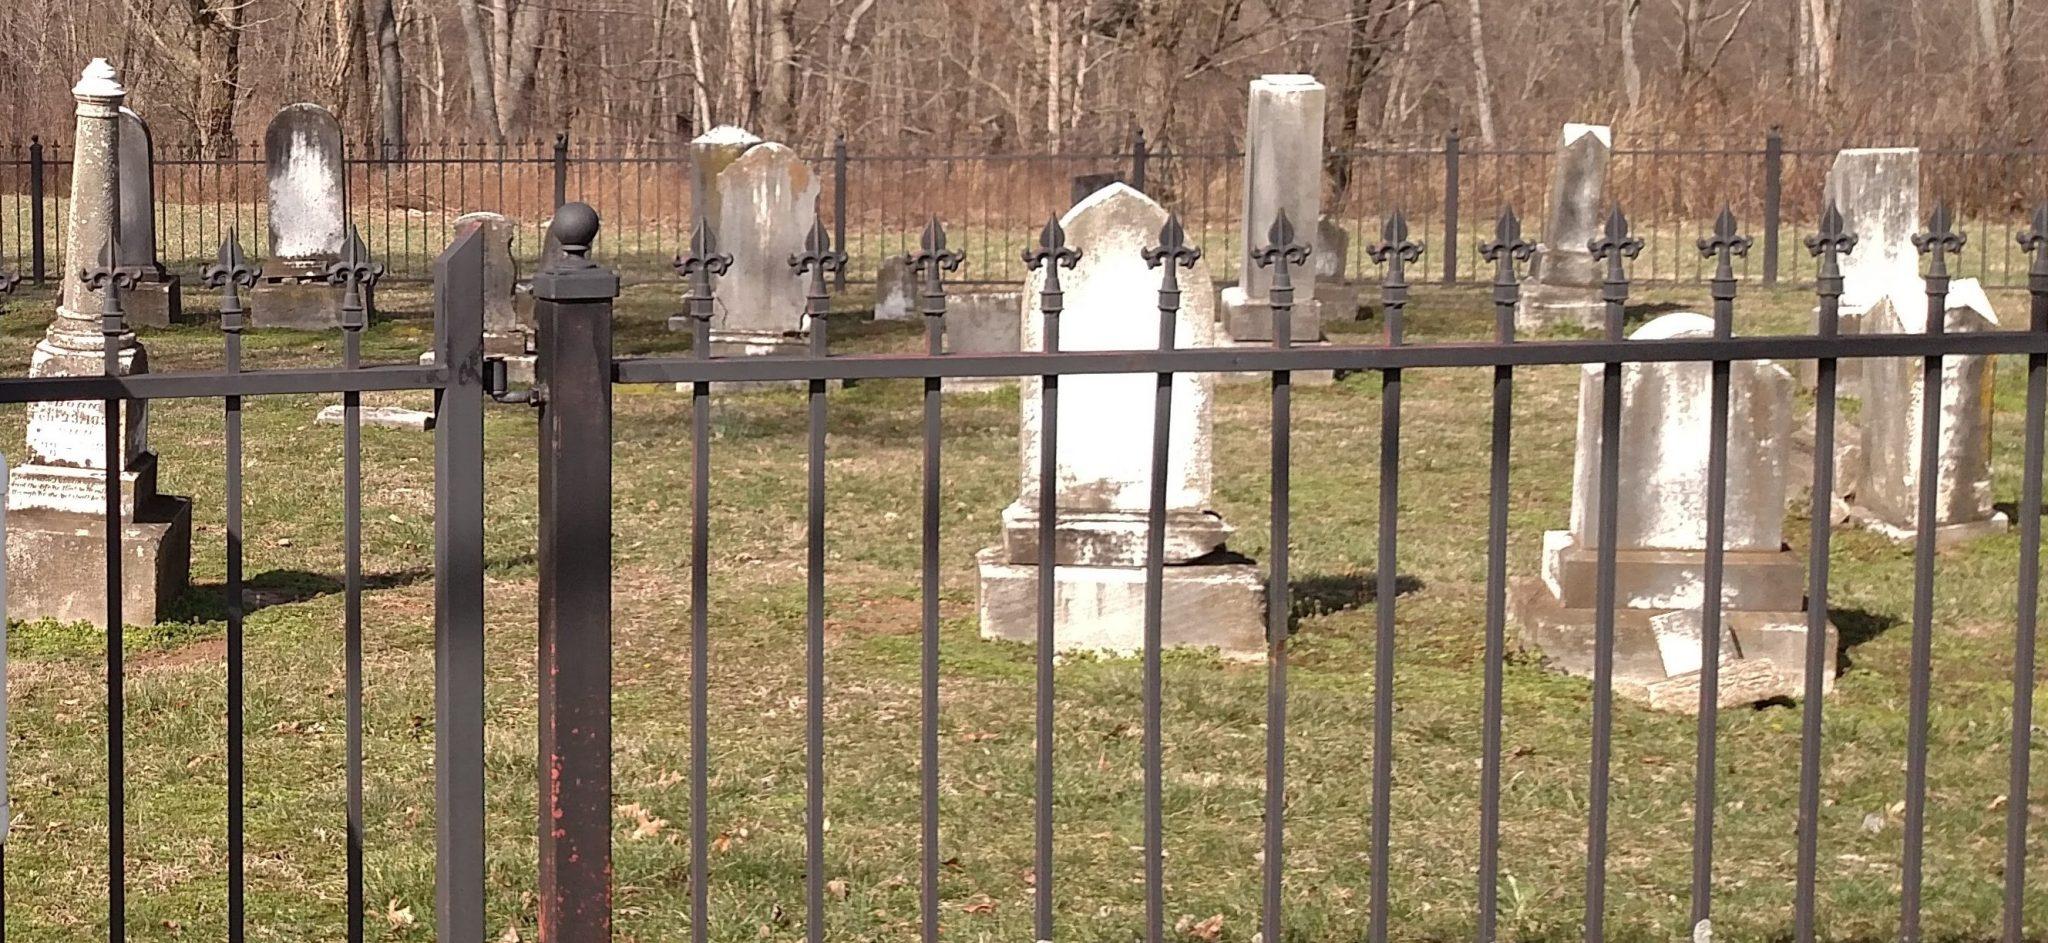 Cemetery in Clarksville, TN, War and Sacrifice